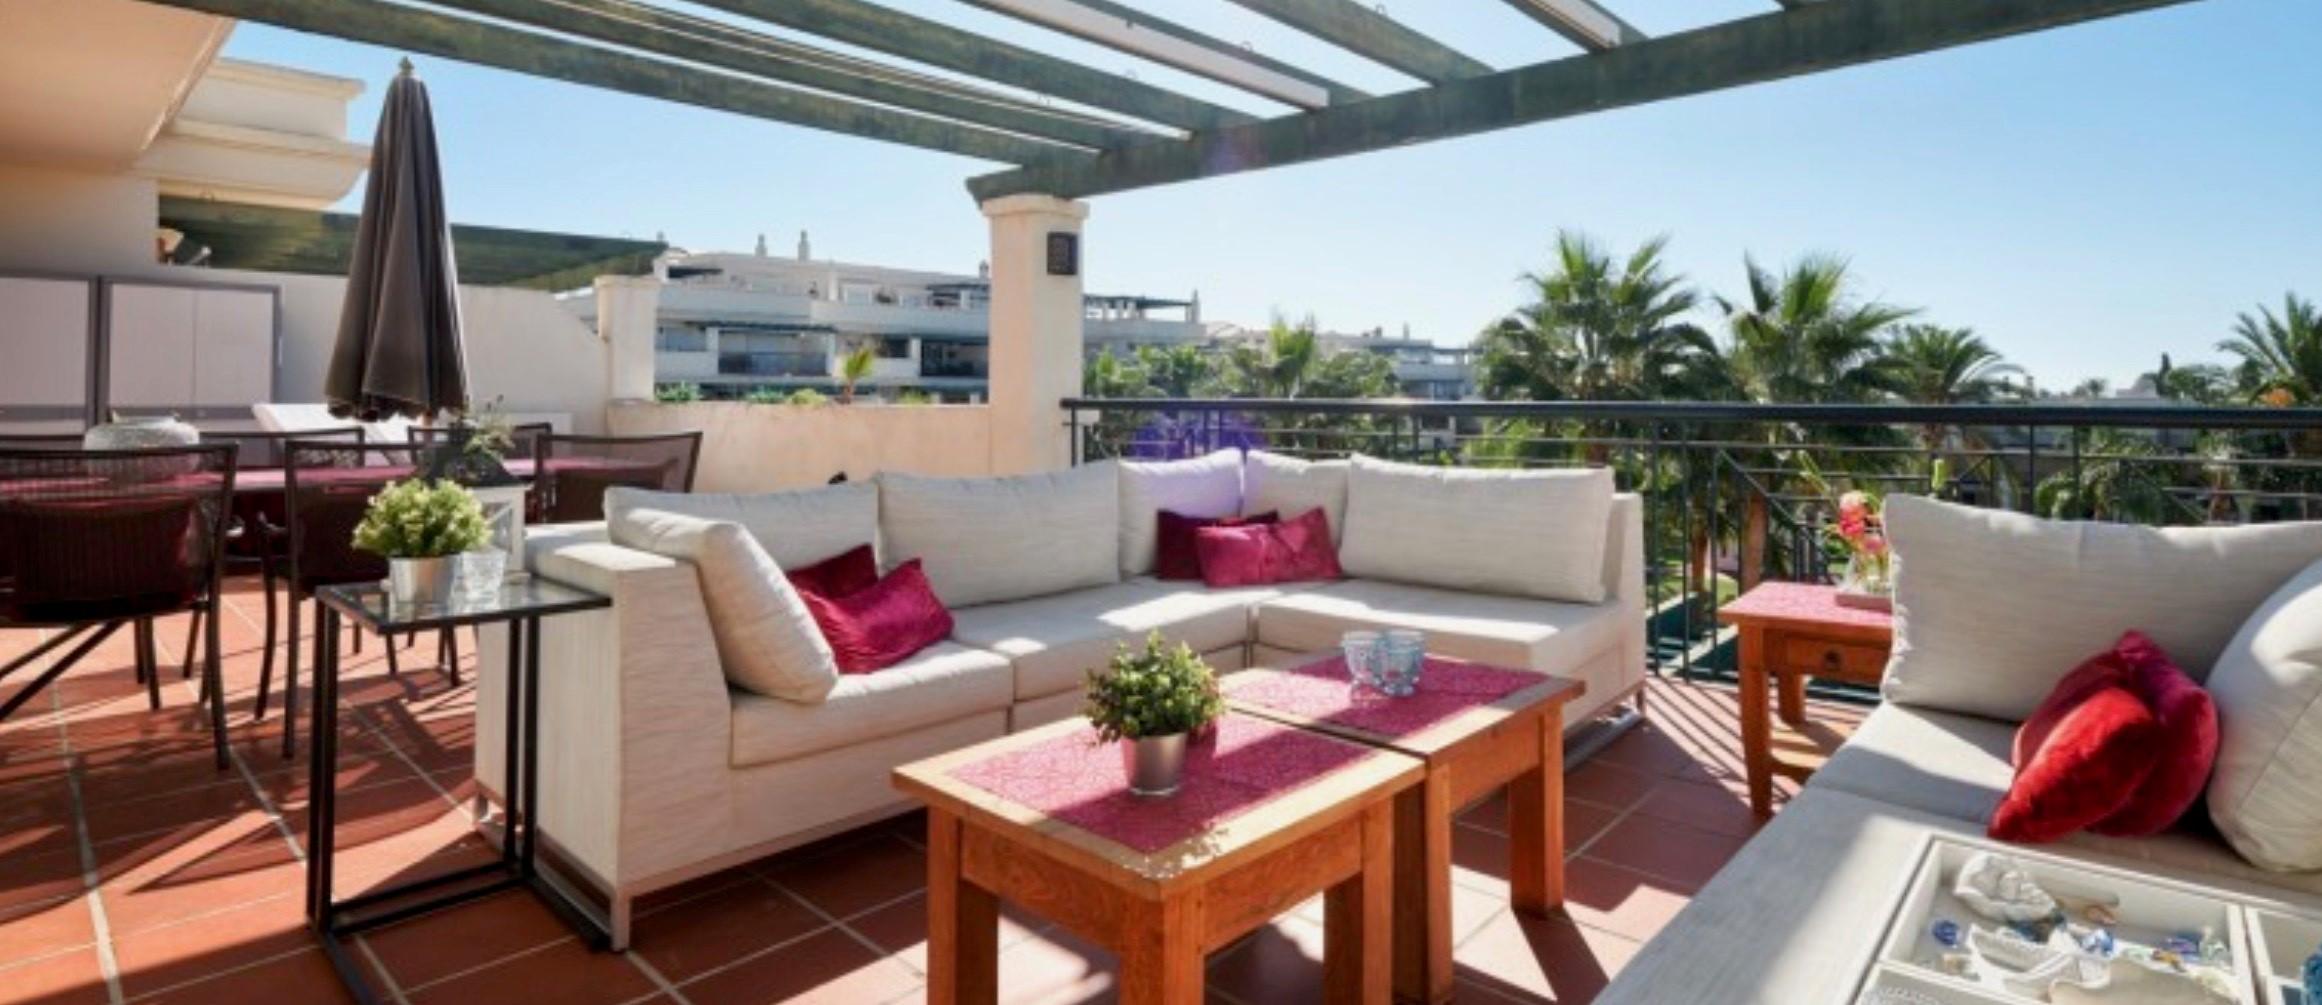 Nueva Andalucia penthouse €339.000